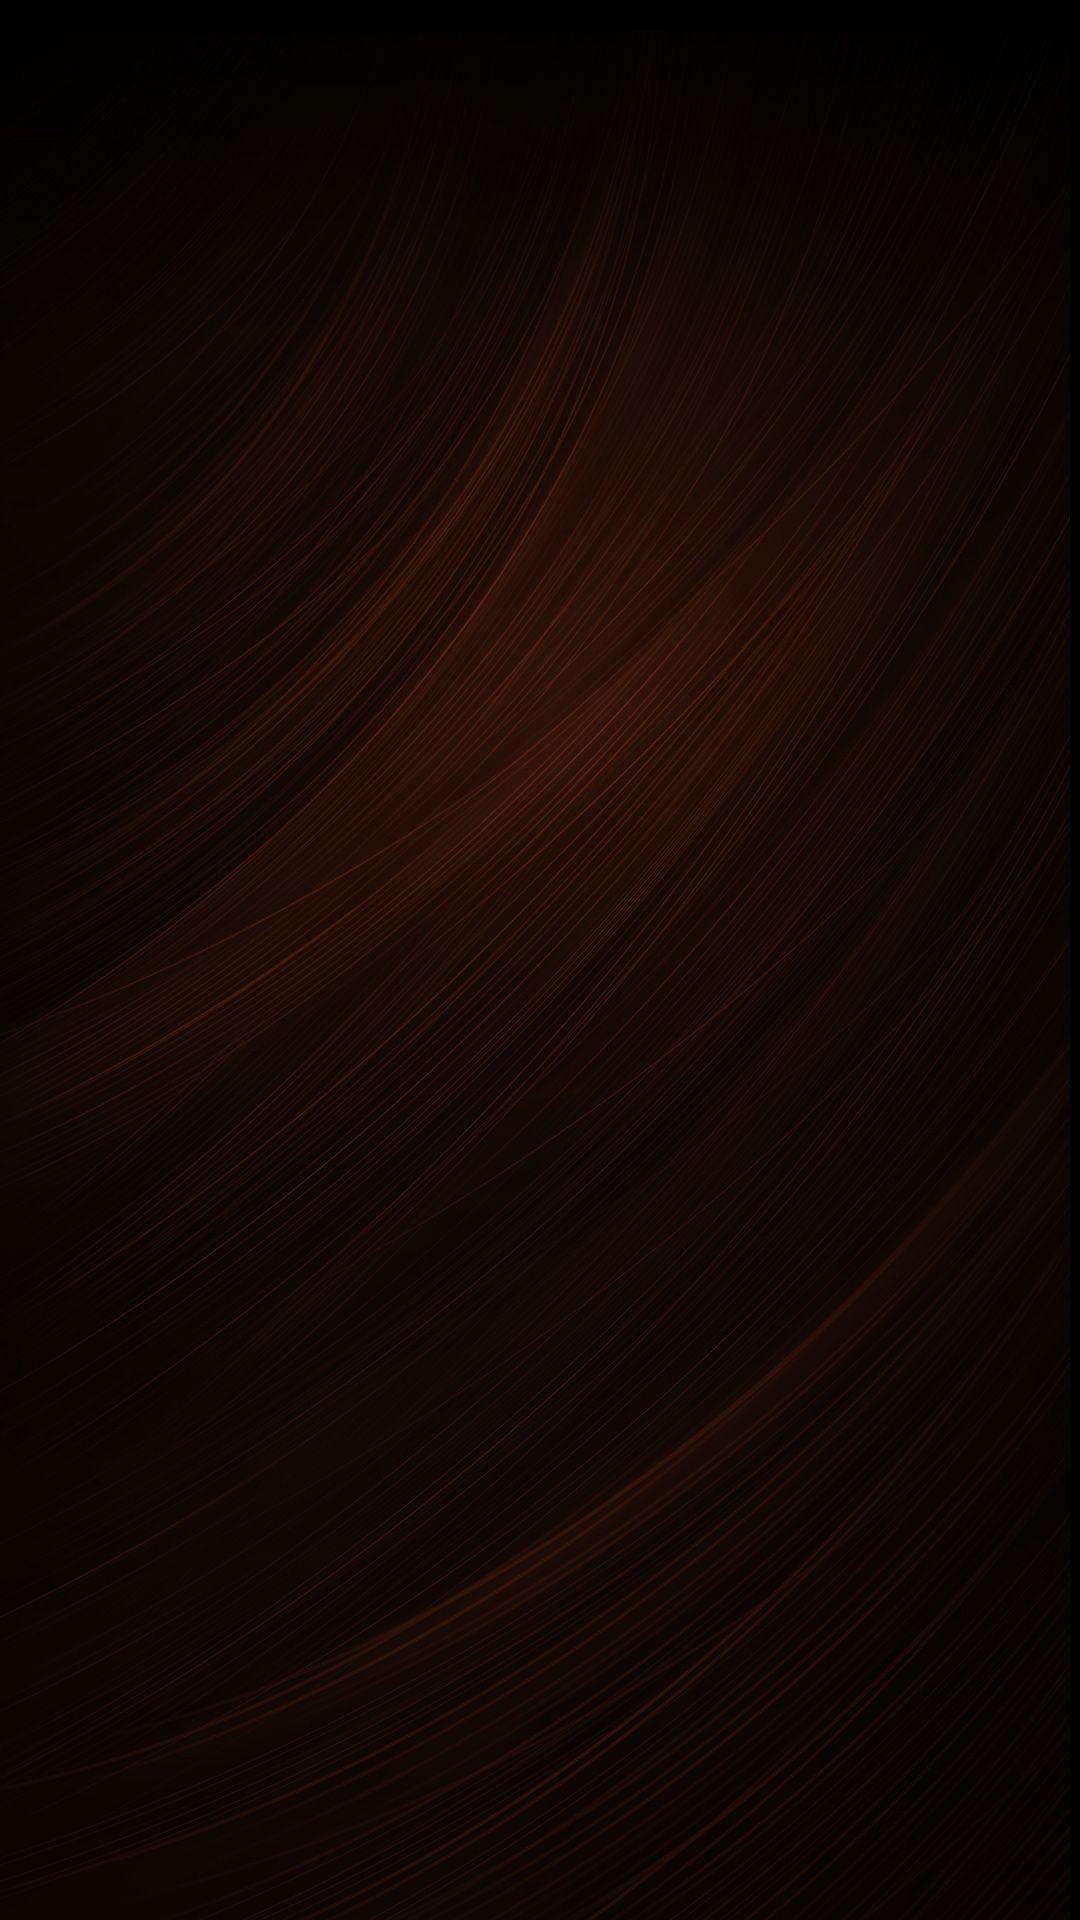 Xiaomi Redmi Y1 (Note 5A) Wallpapers: Xiaomi Redmi Note 4 Wallpapers